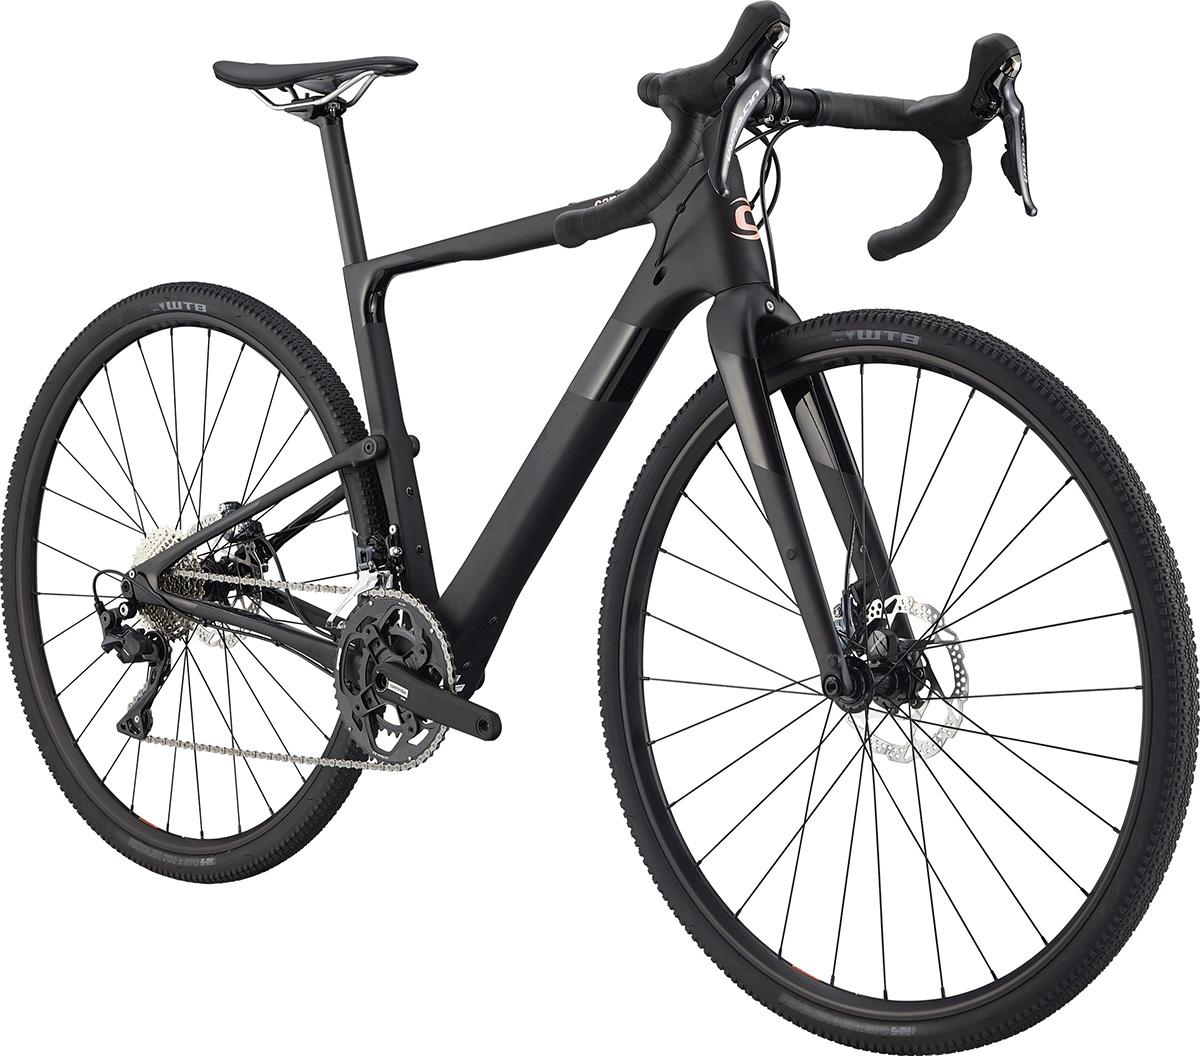 6265636c7e3 Cannondale Womens Topstone Carbon Ultegra RX 2 2020 | Wheelbase